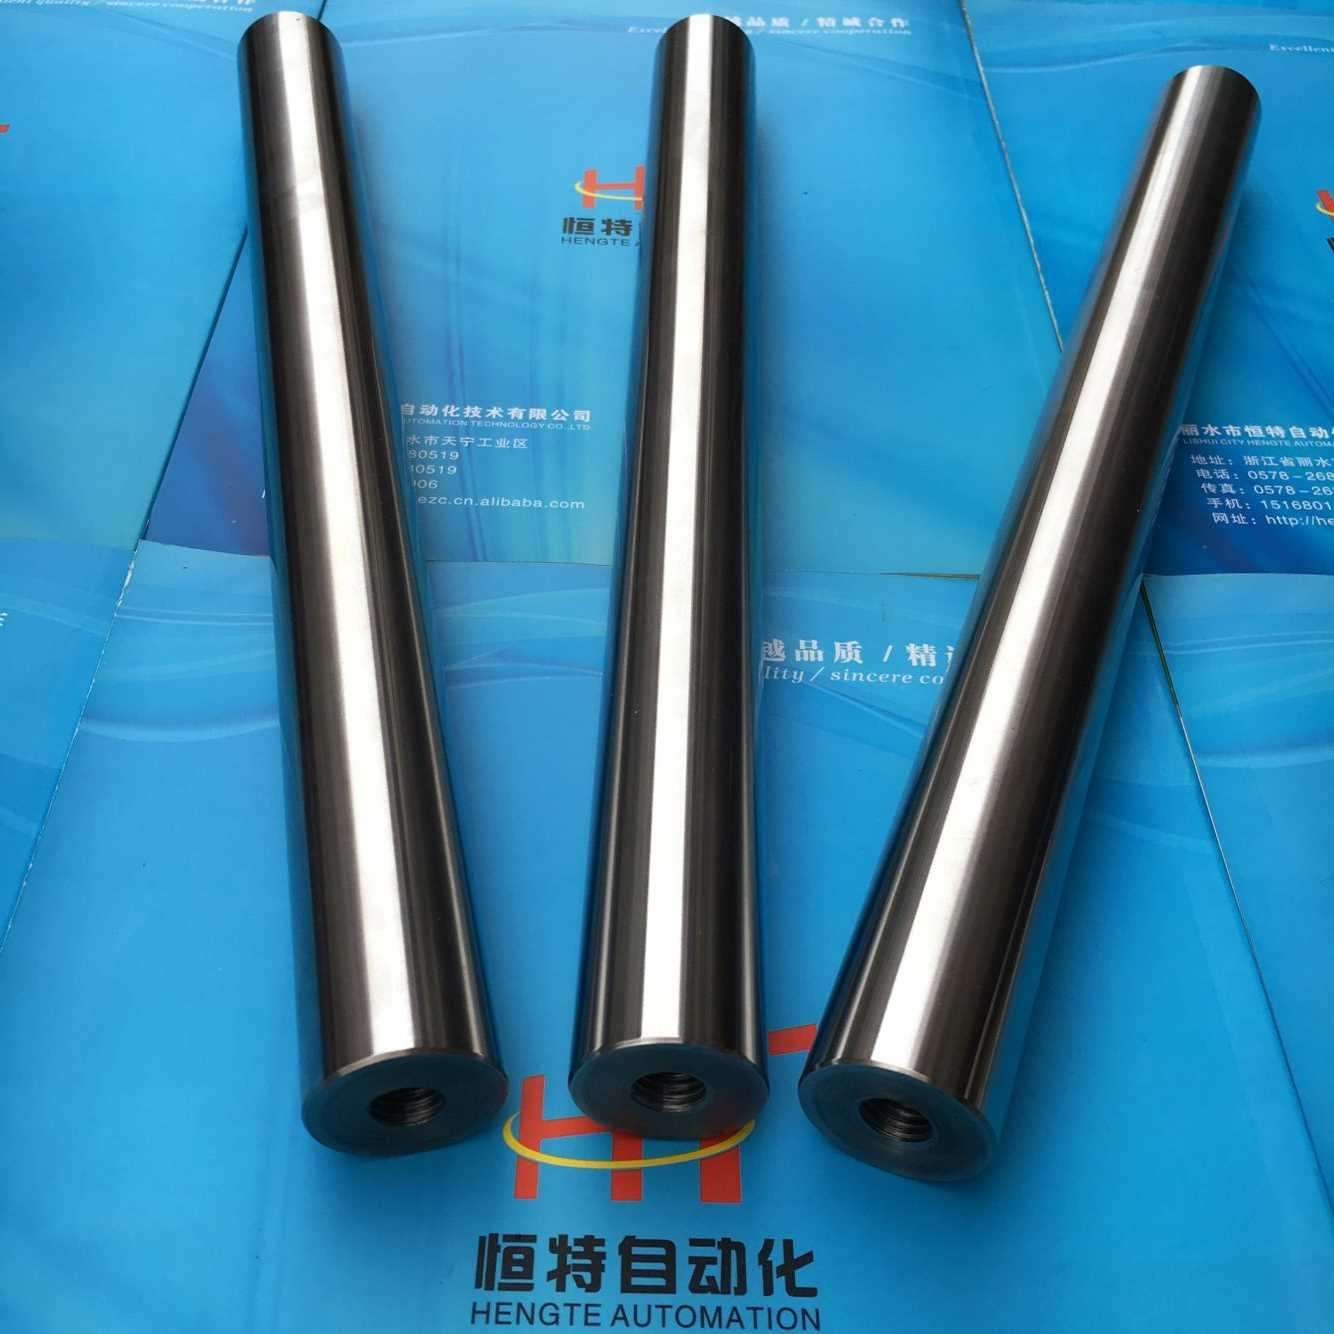 Precision chromium plating hard axis diameter 10/12/16/20/25/30/35/40/50/60 of bearing steel